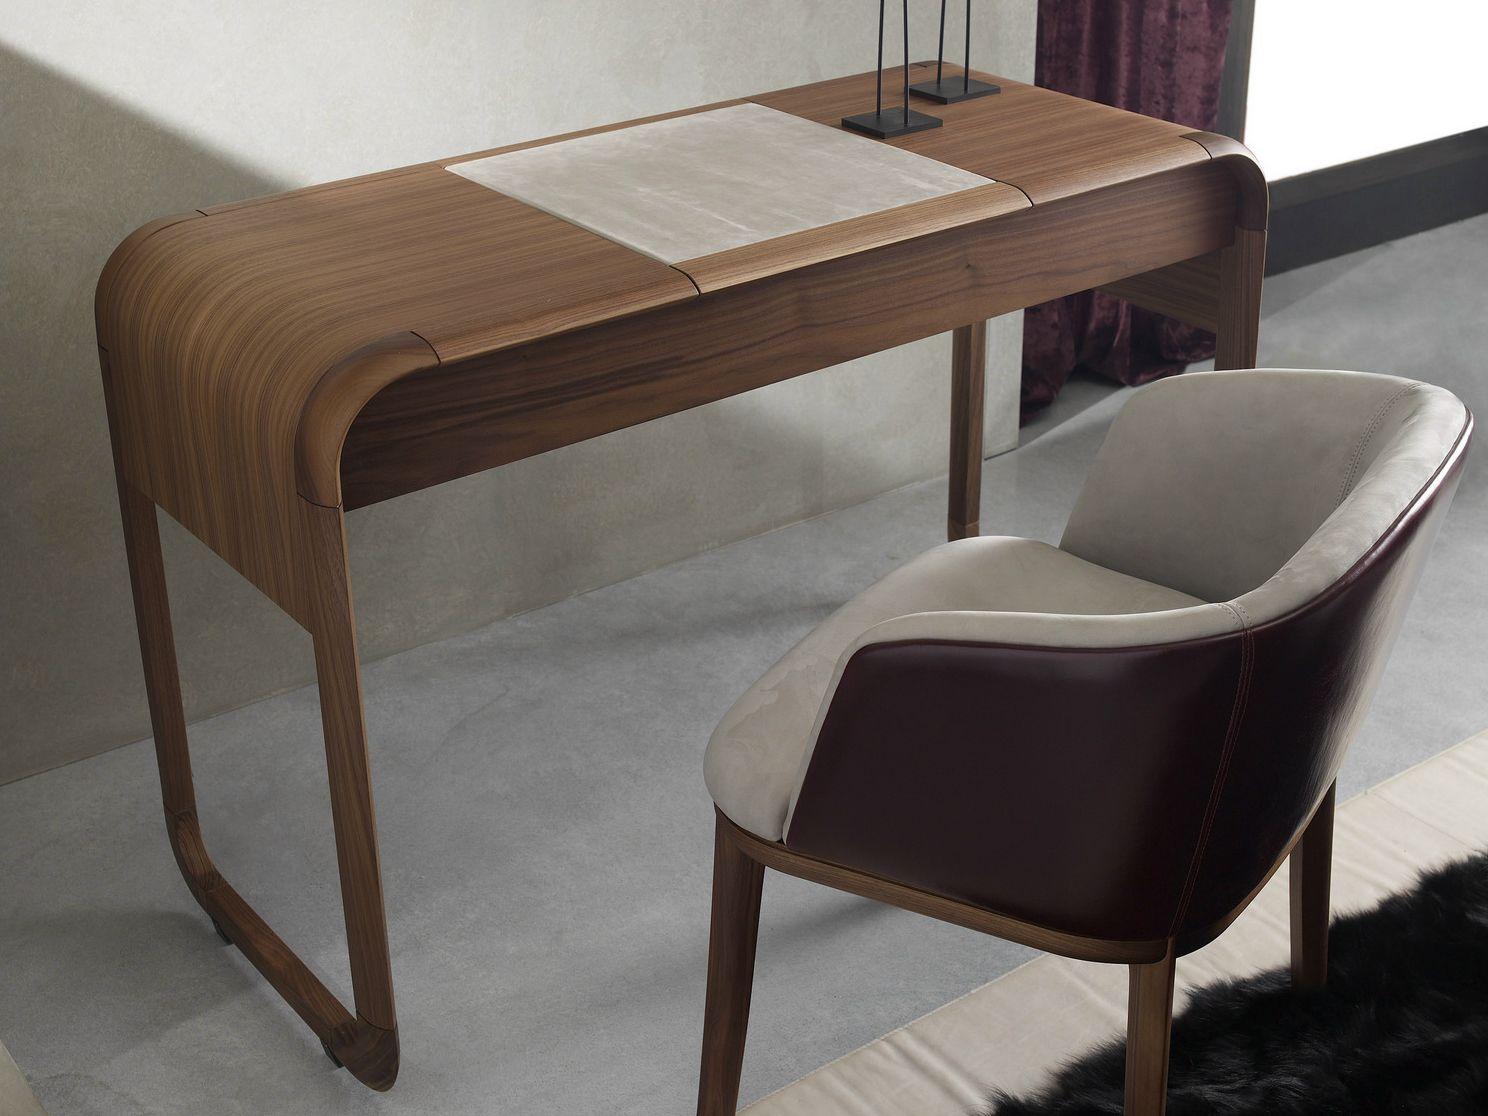 Sleek wooden dressing table